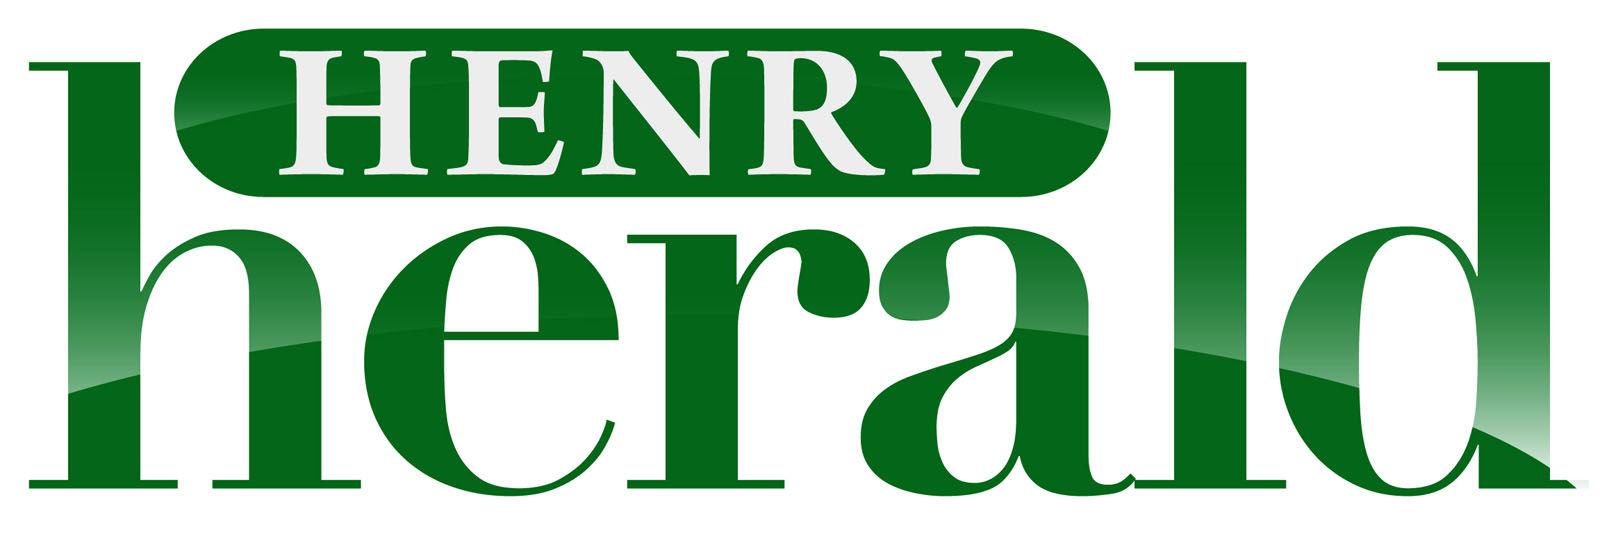 Brady The Gift Of Laughter News Henryherald